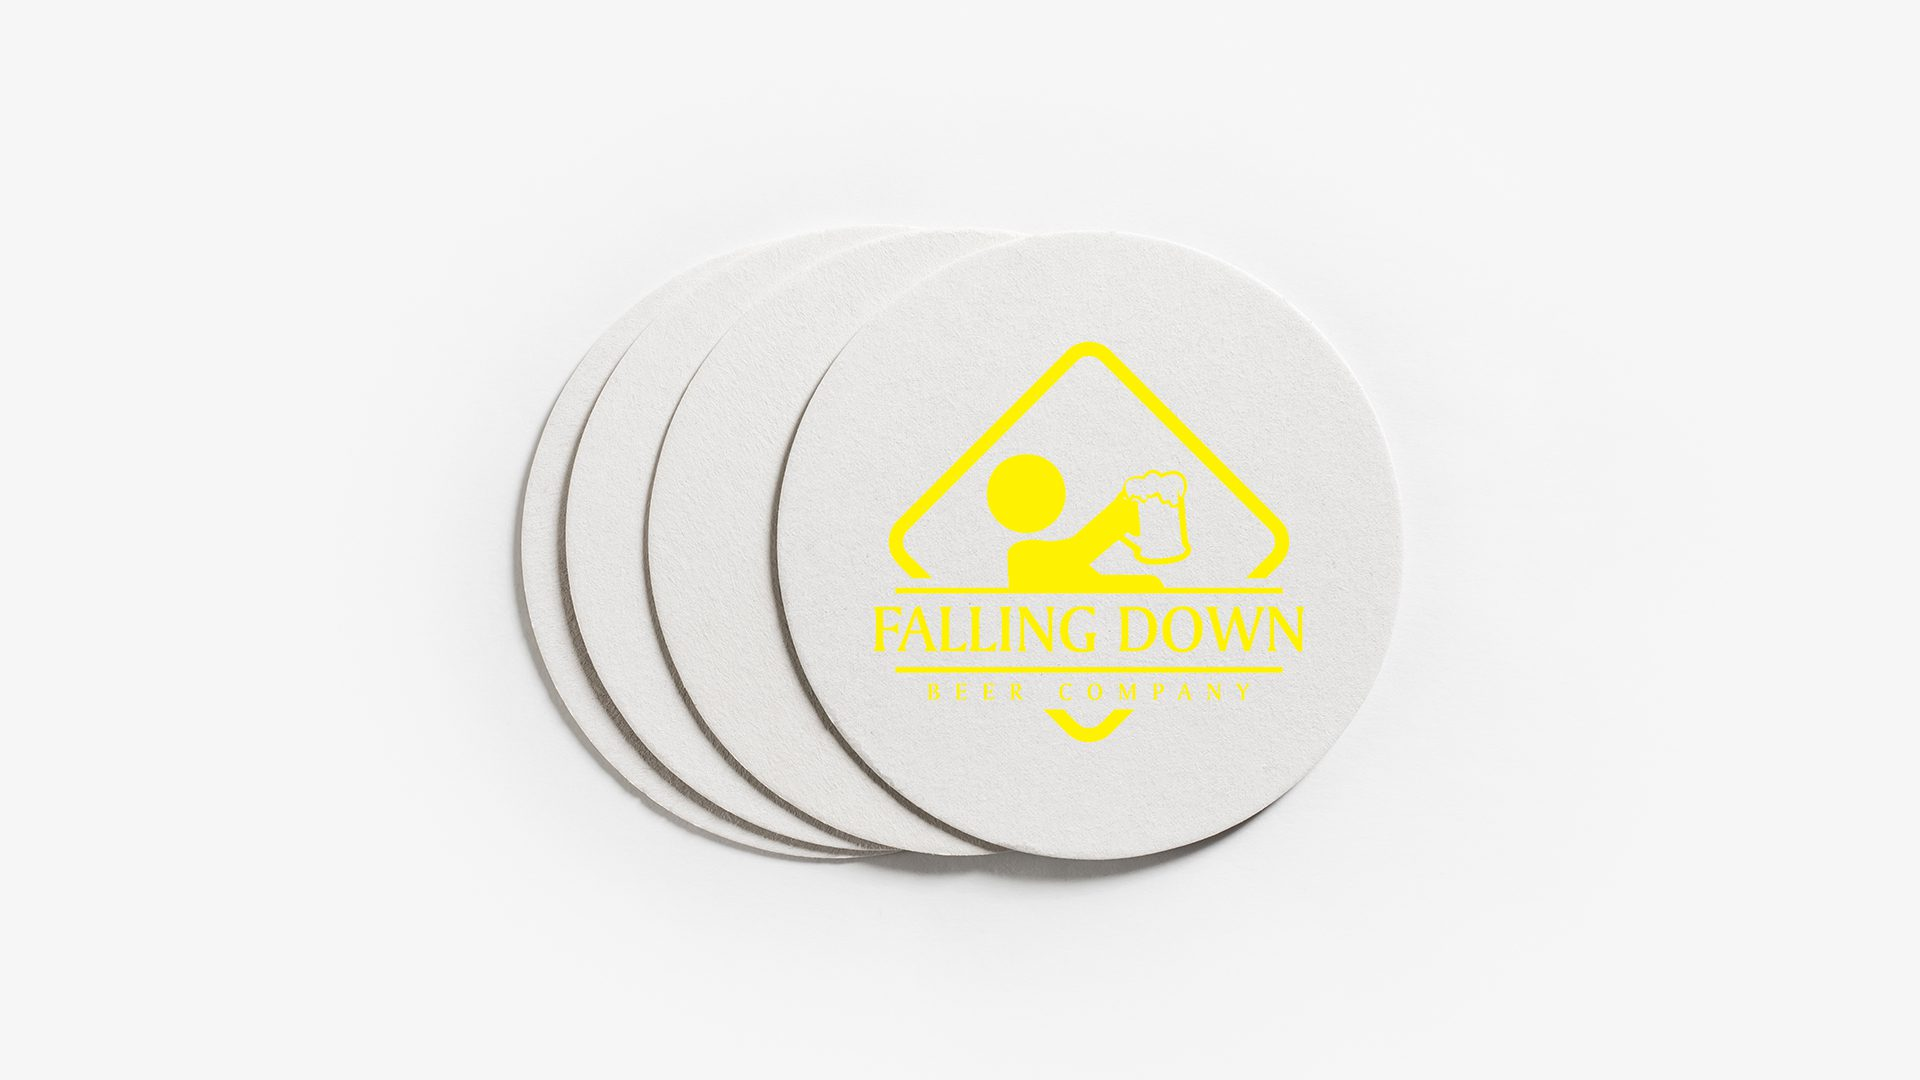 Falling Down Beer Company - Coasters Mockup 03